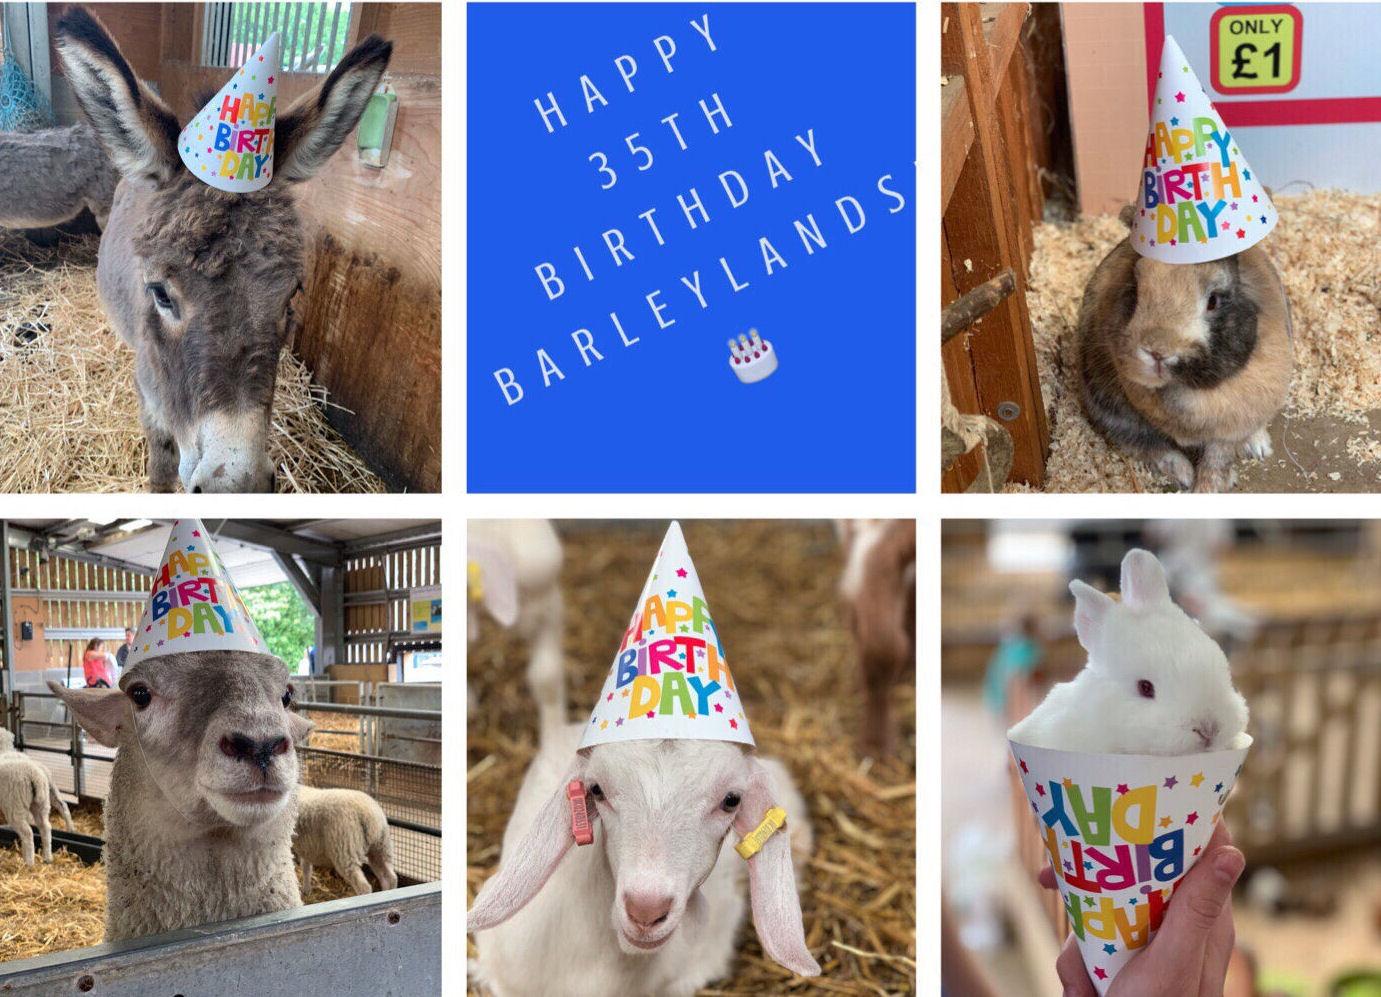 Celebrate Barleylands 35th Birthday